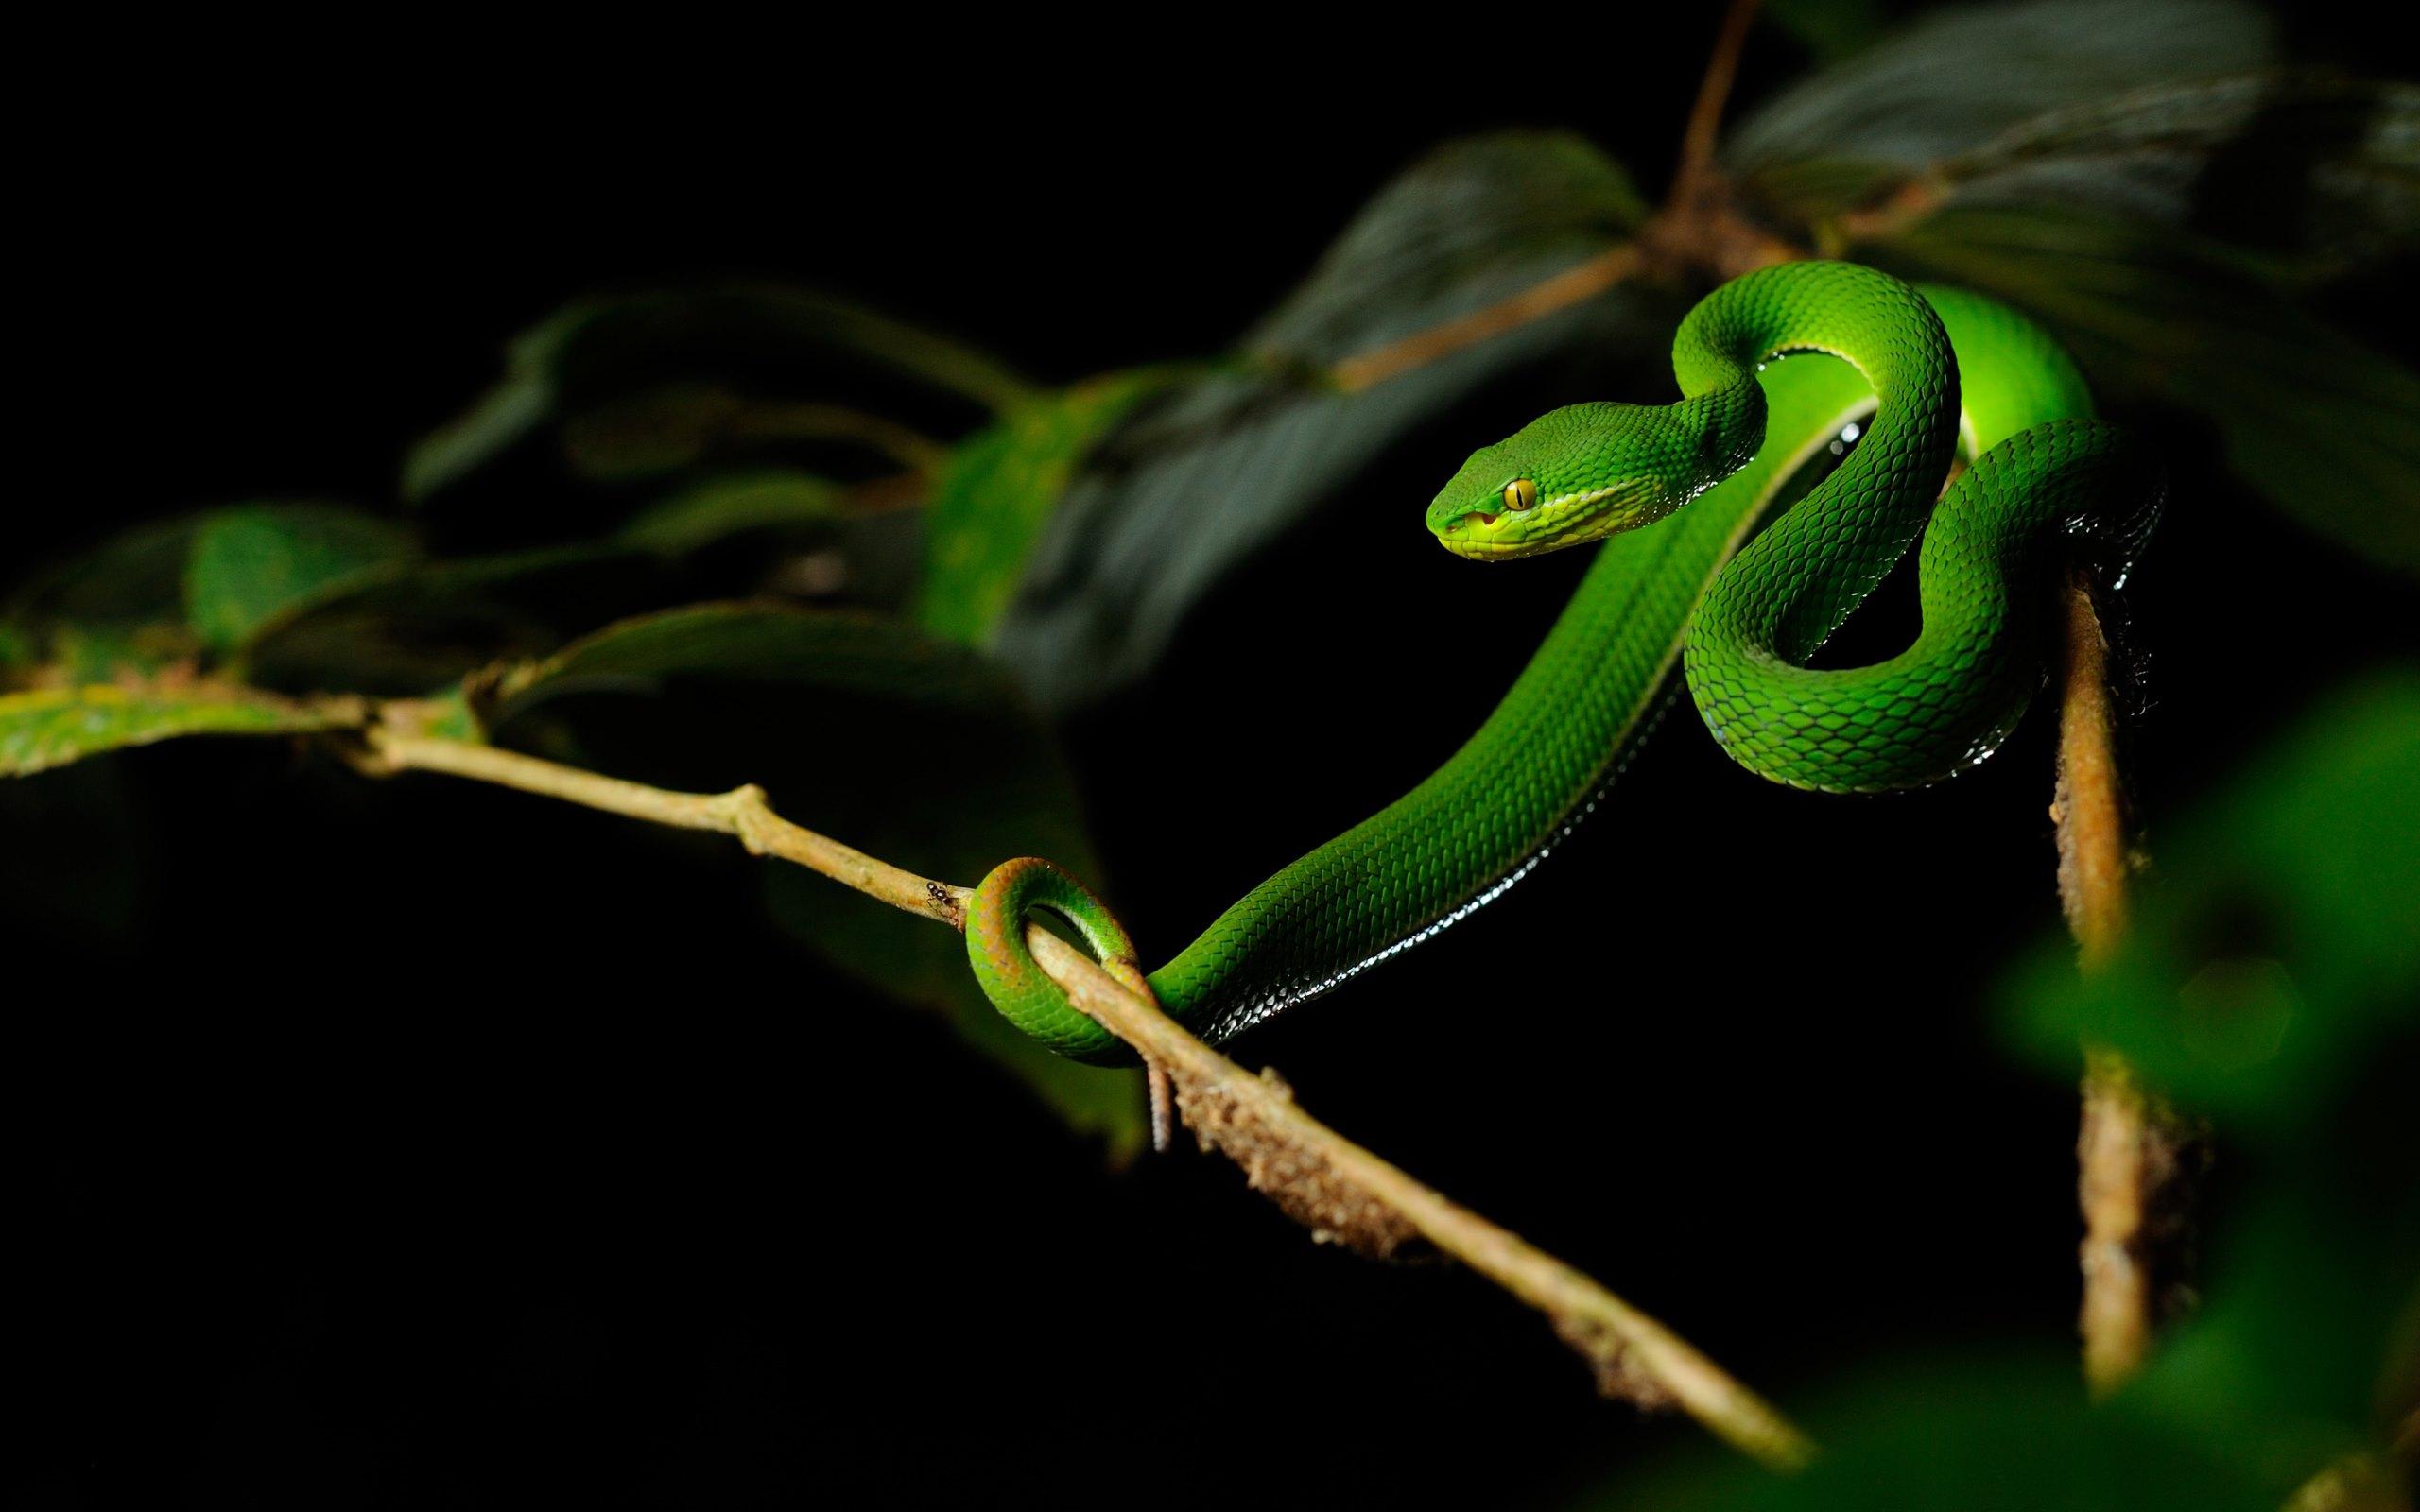 Pit viper snake wallpaper - photo#3